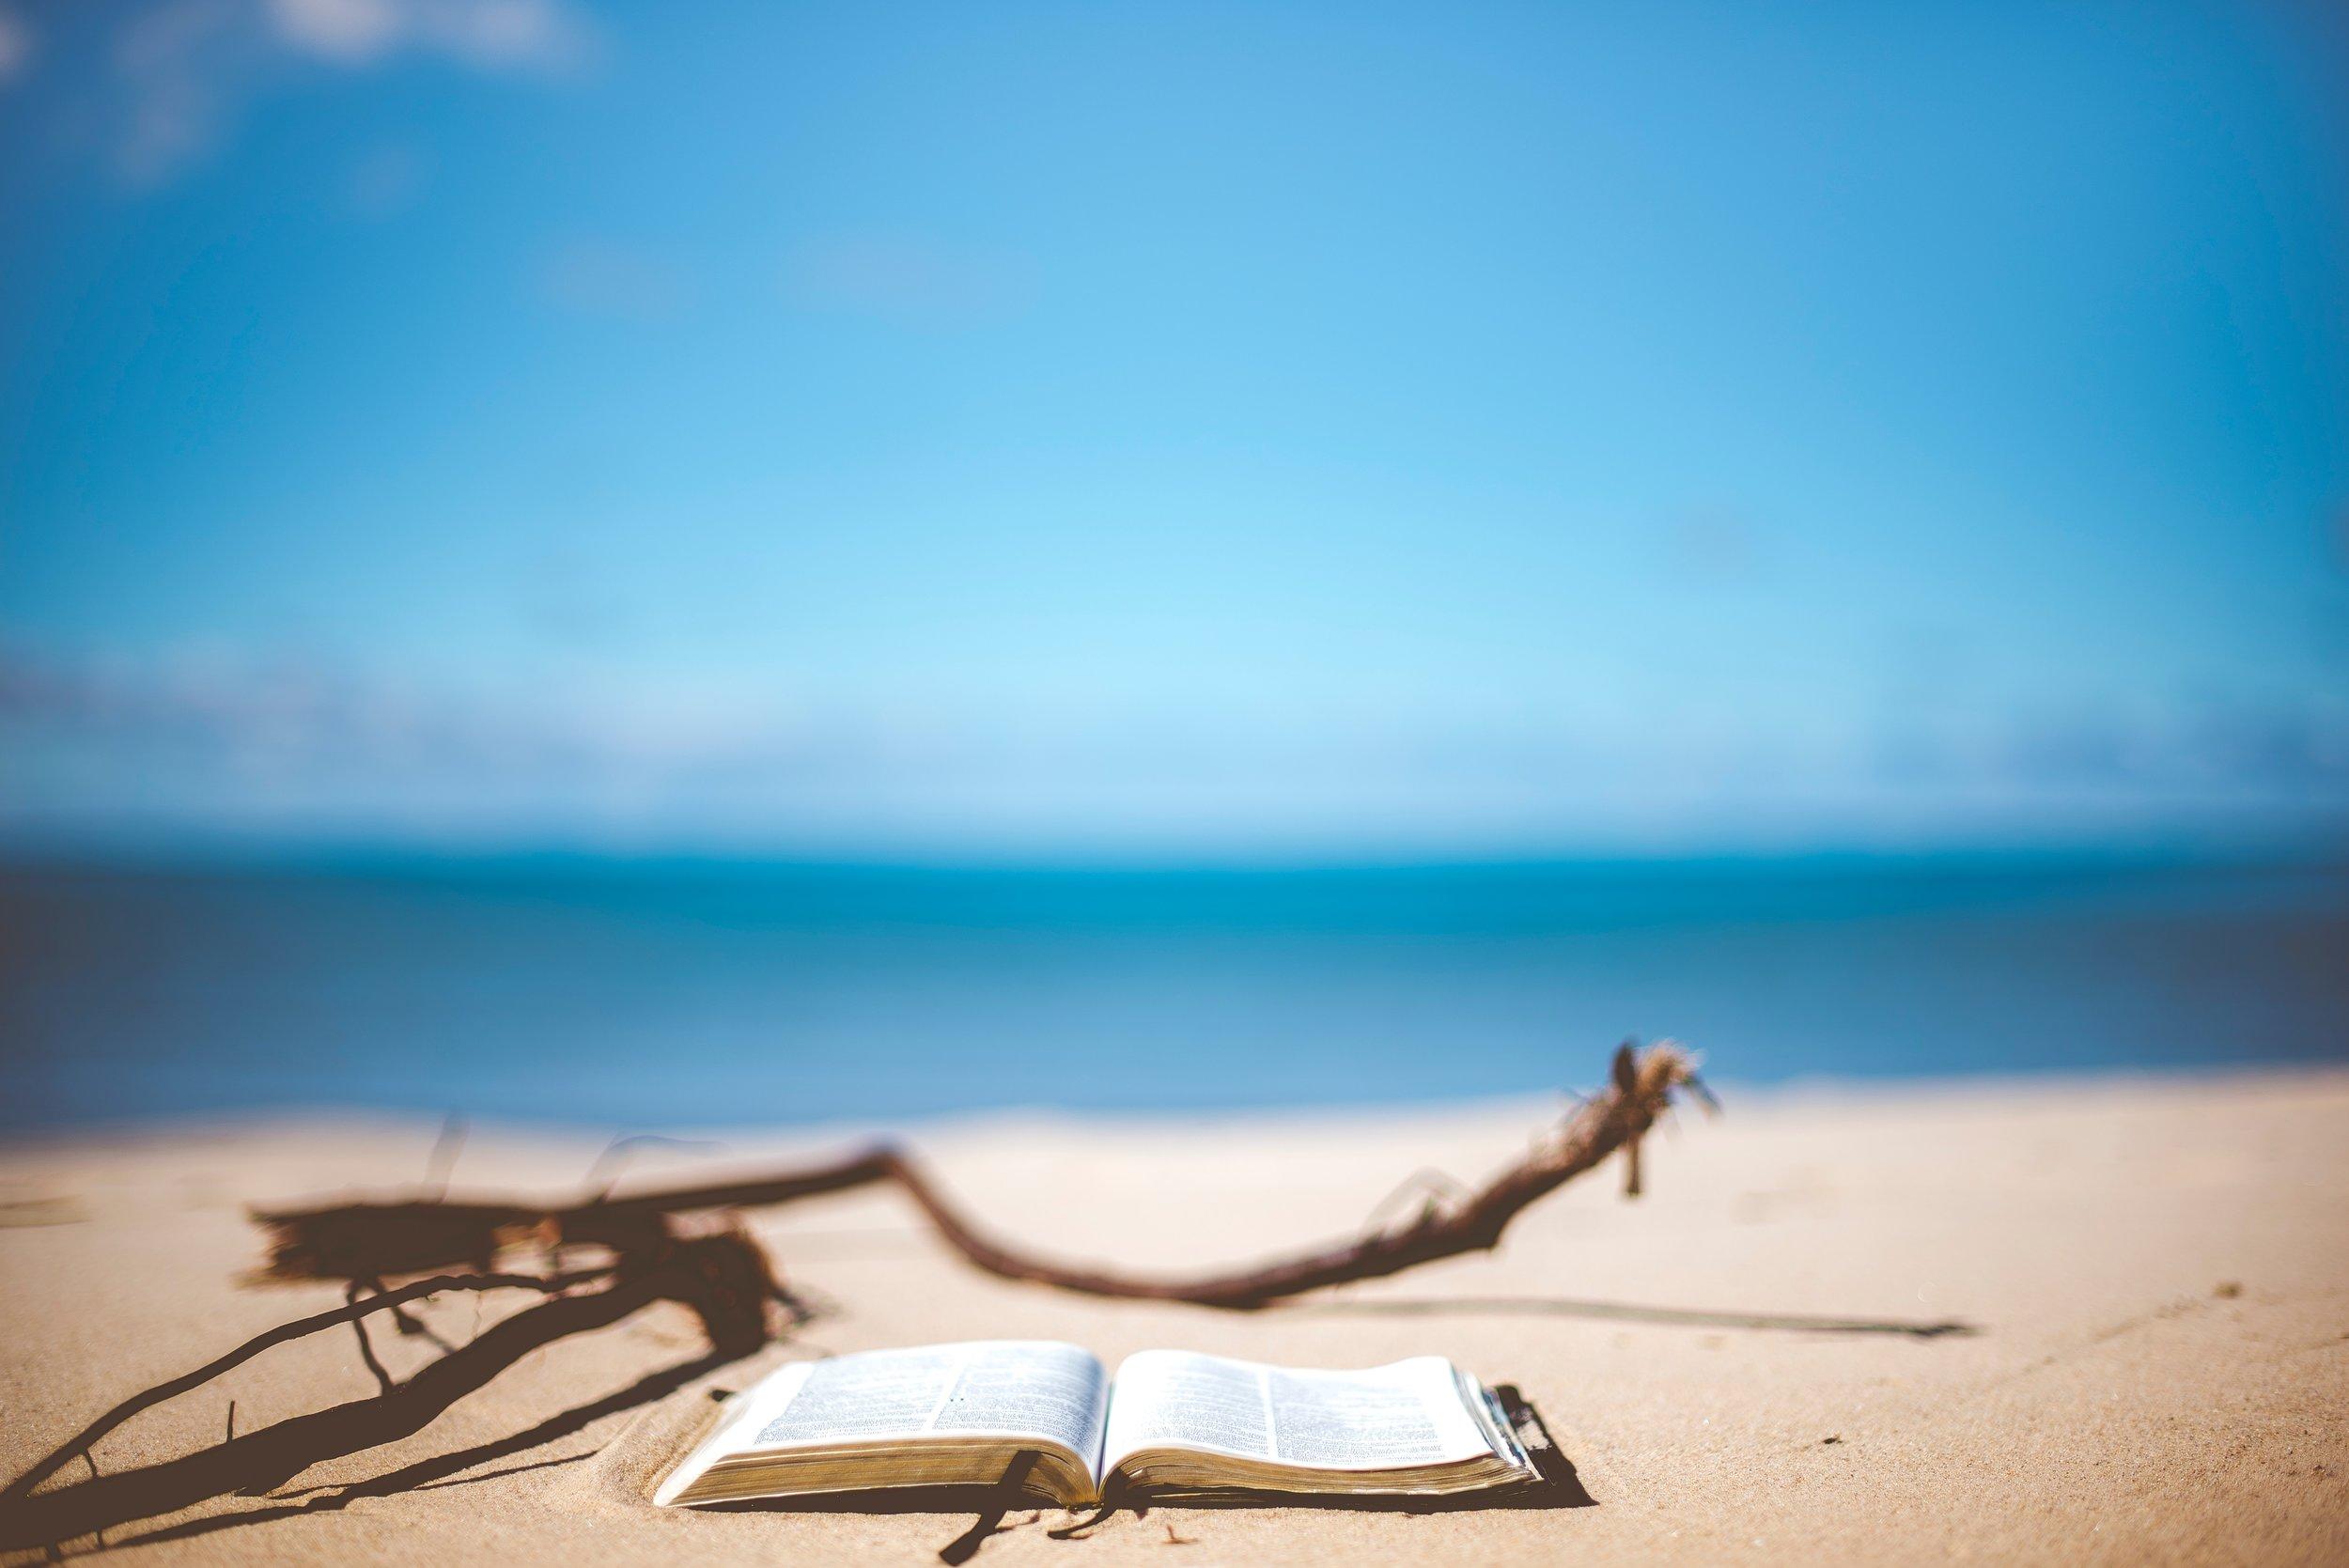 Bible by sea.jpg